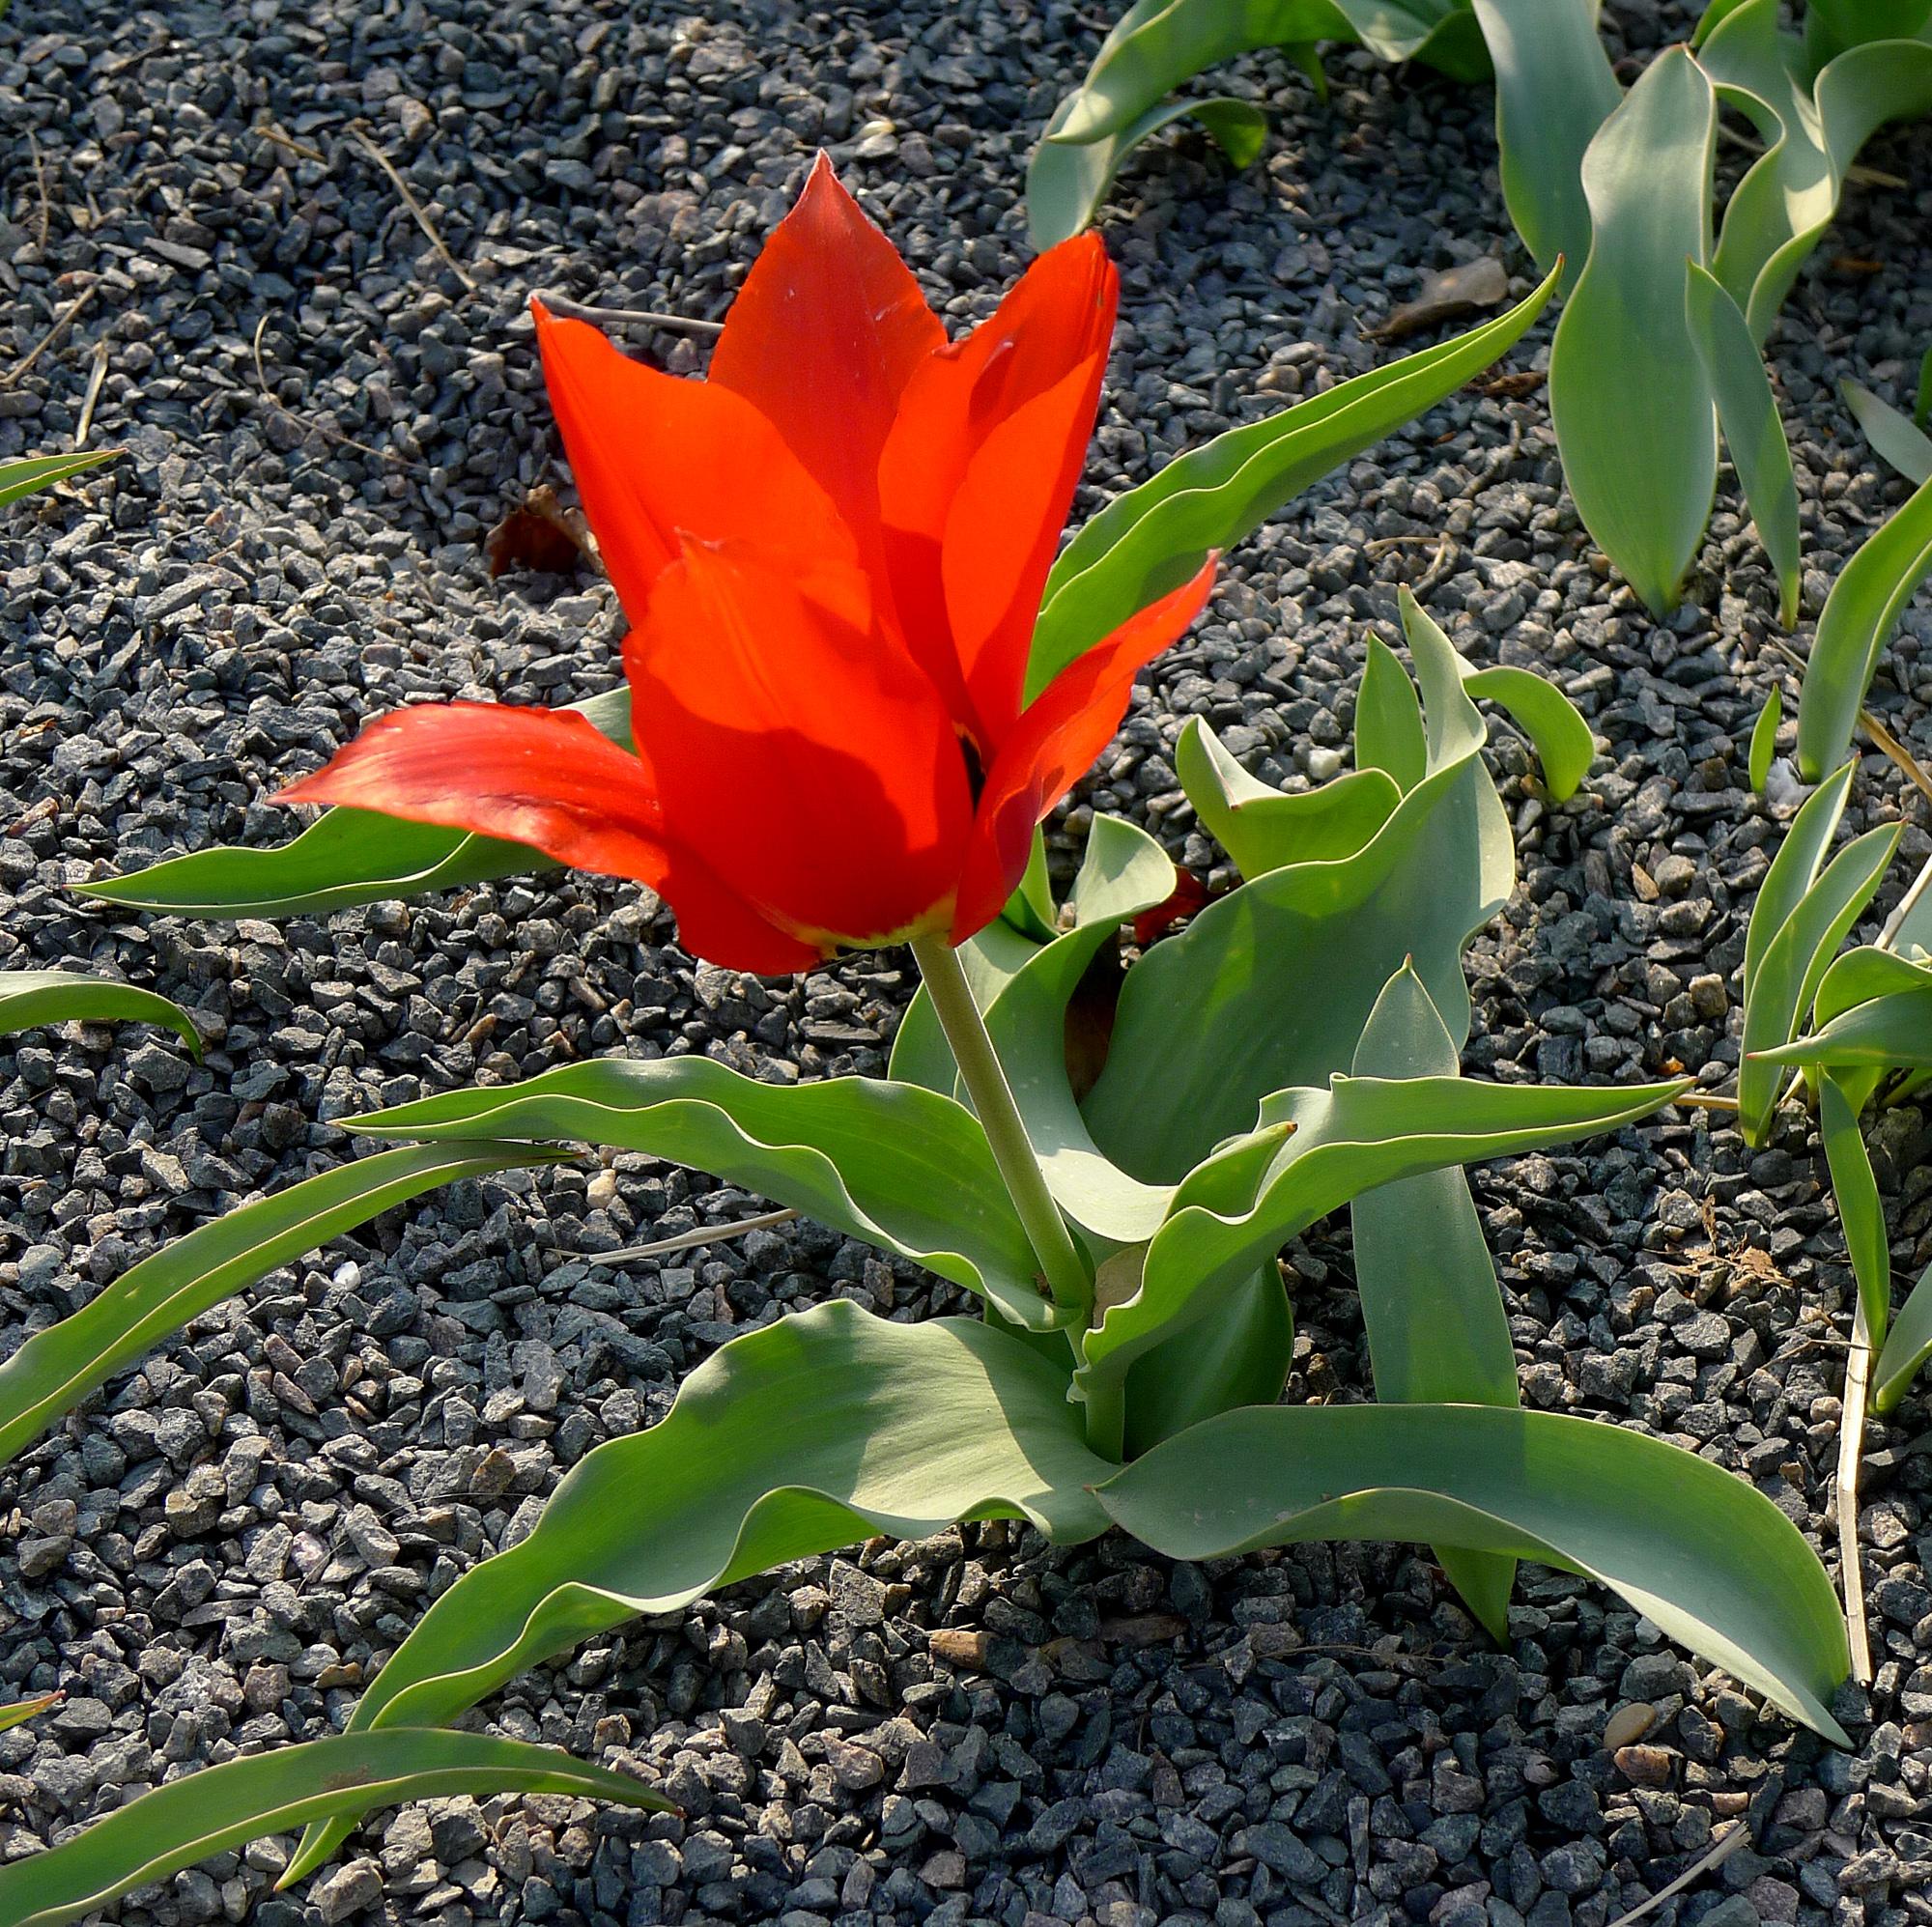 Tulipa undulatifolia Picture Mbzt CC BY-SA 3.0